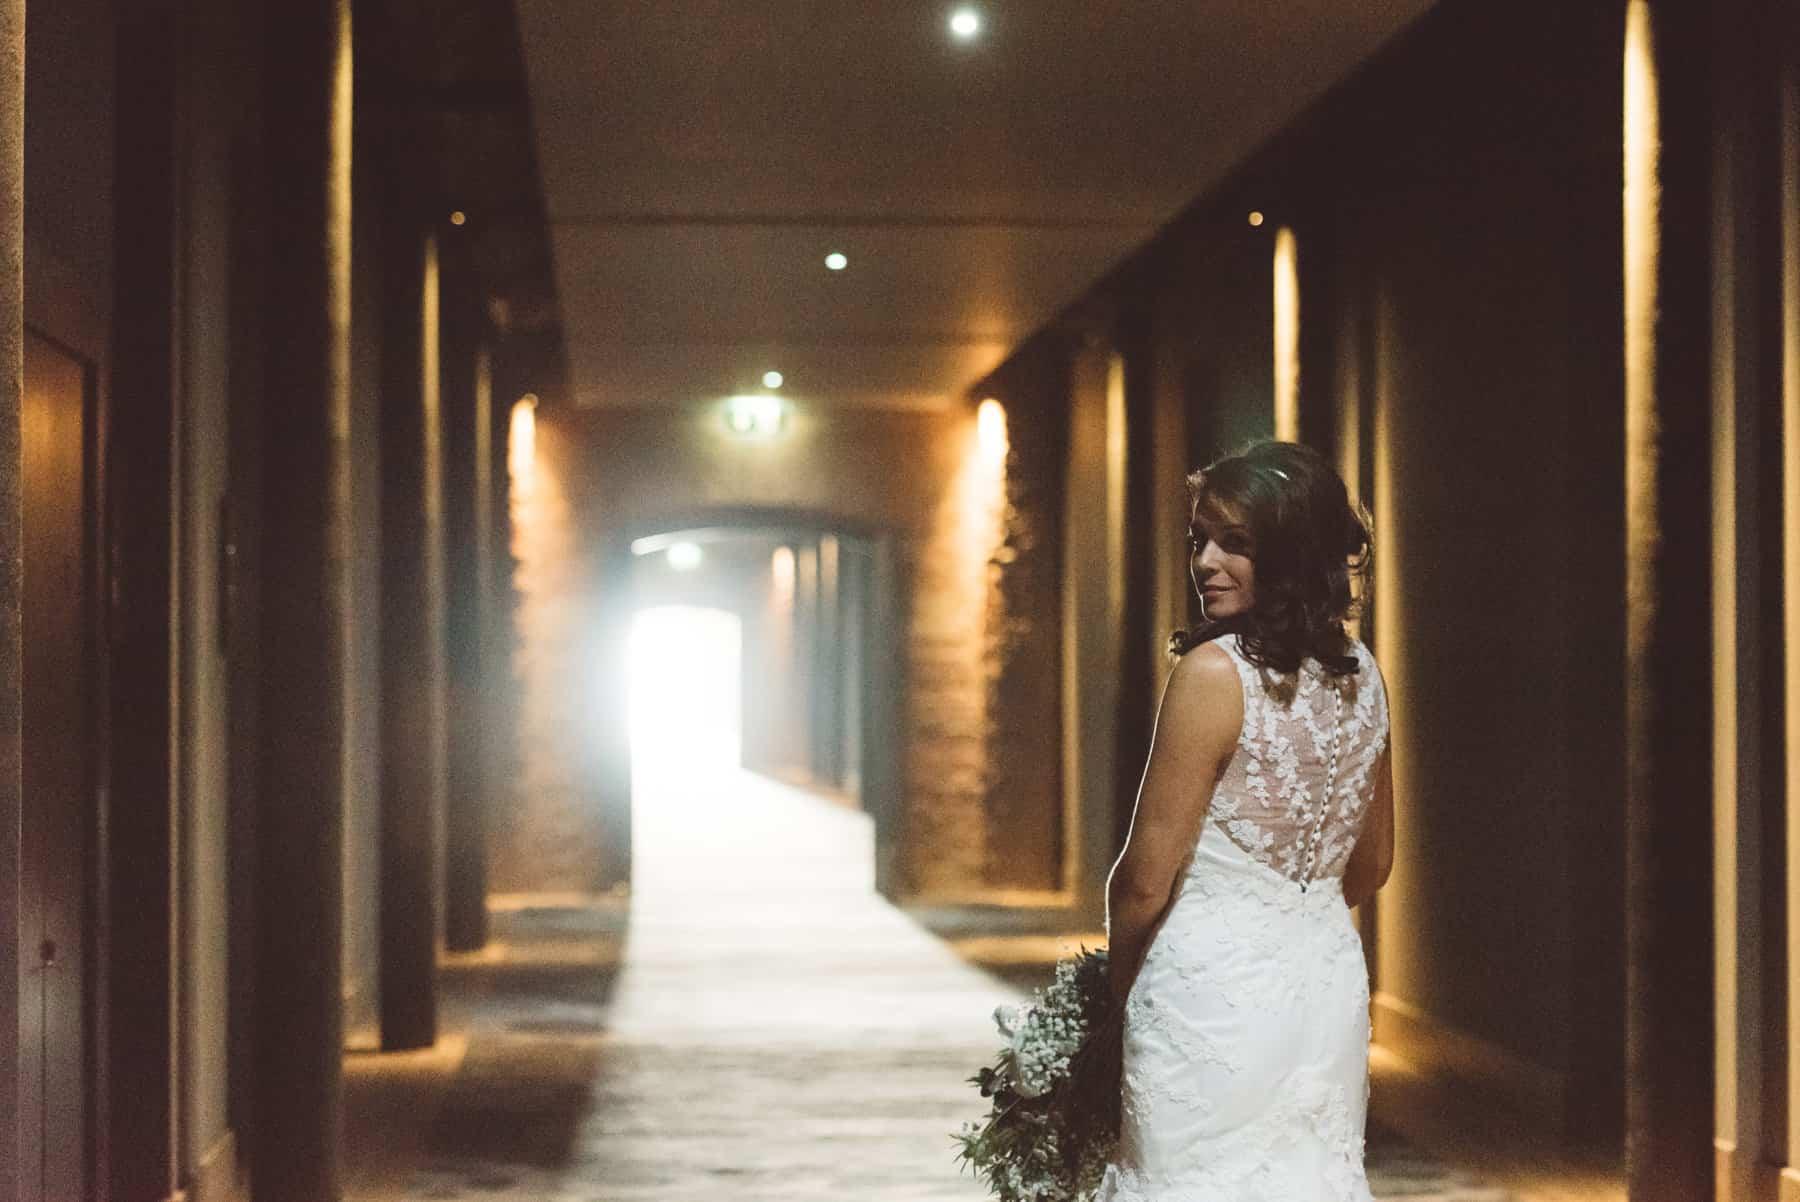 wedding photography bridal prep (1 of 1)